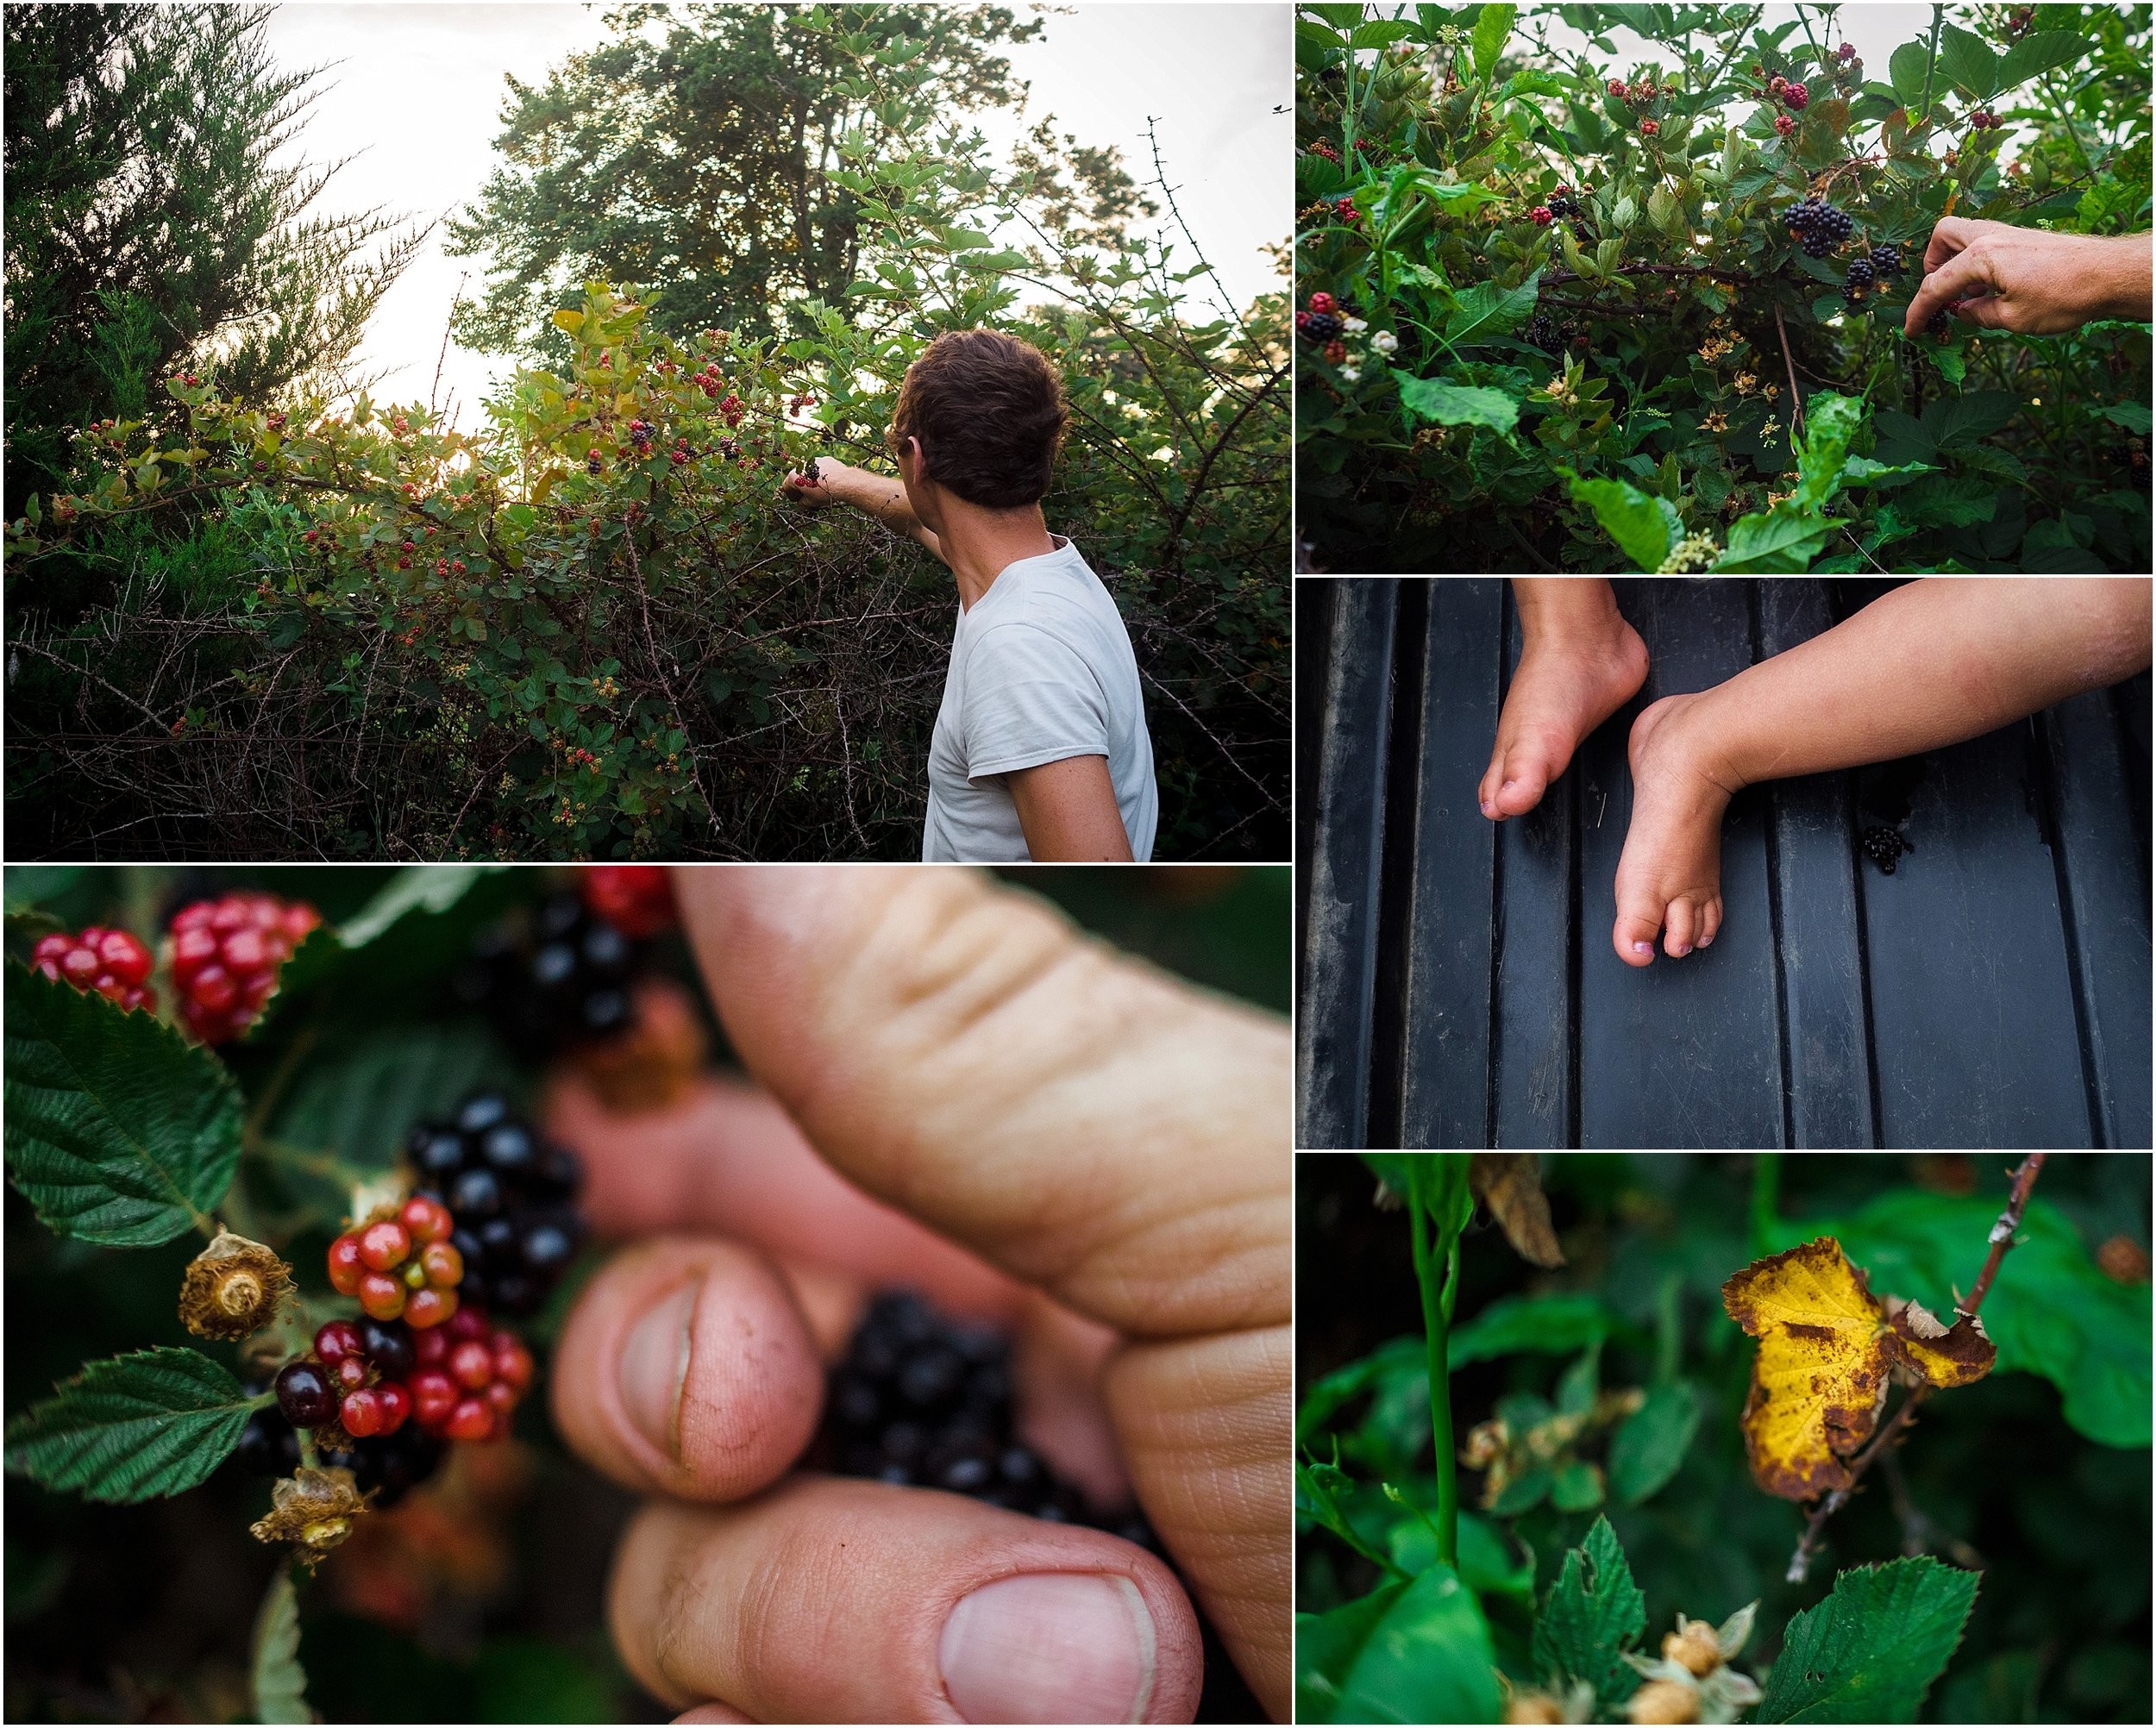 blackberry picking in backyard, documentary photographer